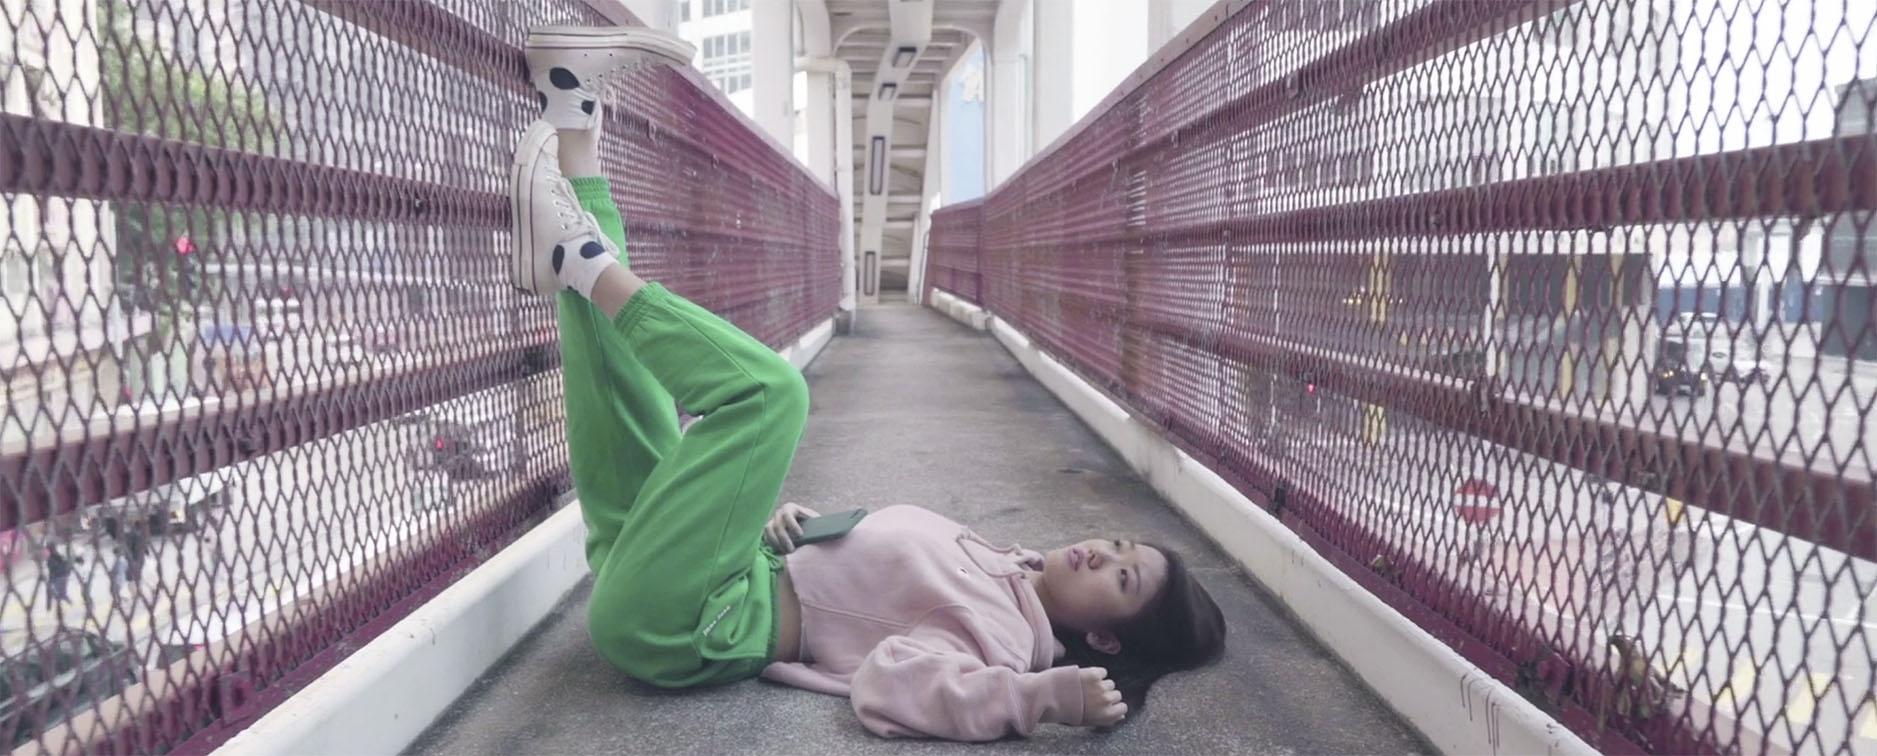 Boys & Girls Clubs Association of Hong Kong highlights their youth hubs via new Kymechow campaign